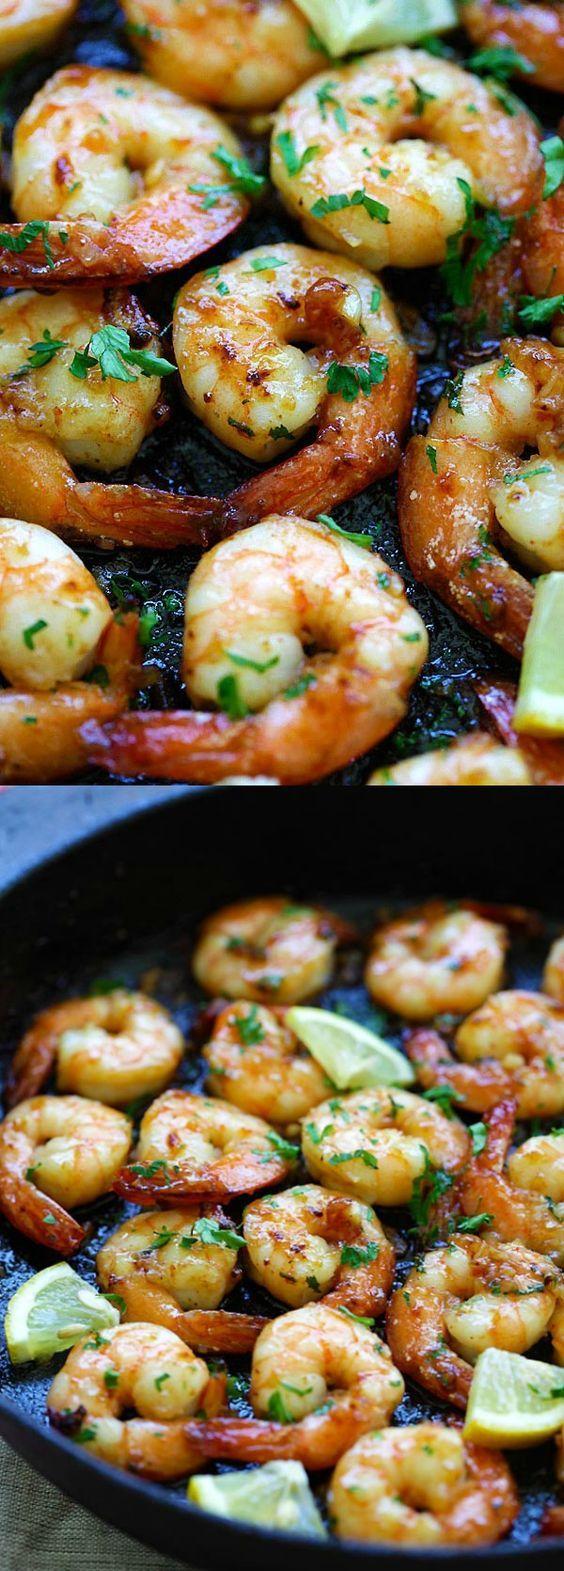 Honey Garlic Shrimp - http://rasamalaysia.com/honey-garlic-shrimp/?utm_source=feedburner&utm_medium=feed&utm_campaign=Feed%3A+rasamalaysia+%28Rasa+Malaysia%3A+Easy+Asian+Recipes%29